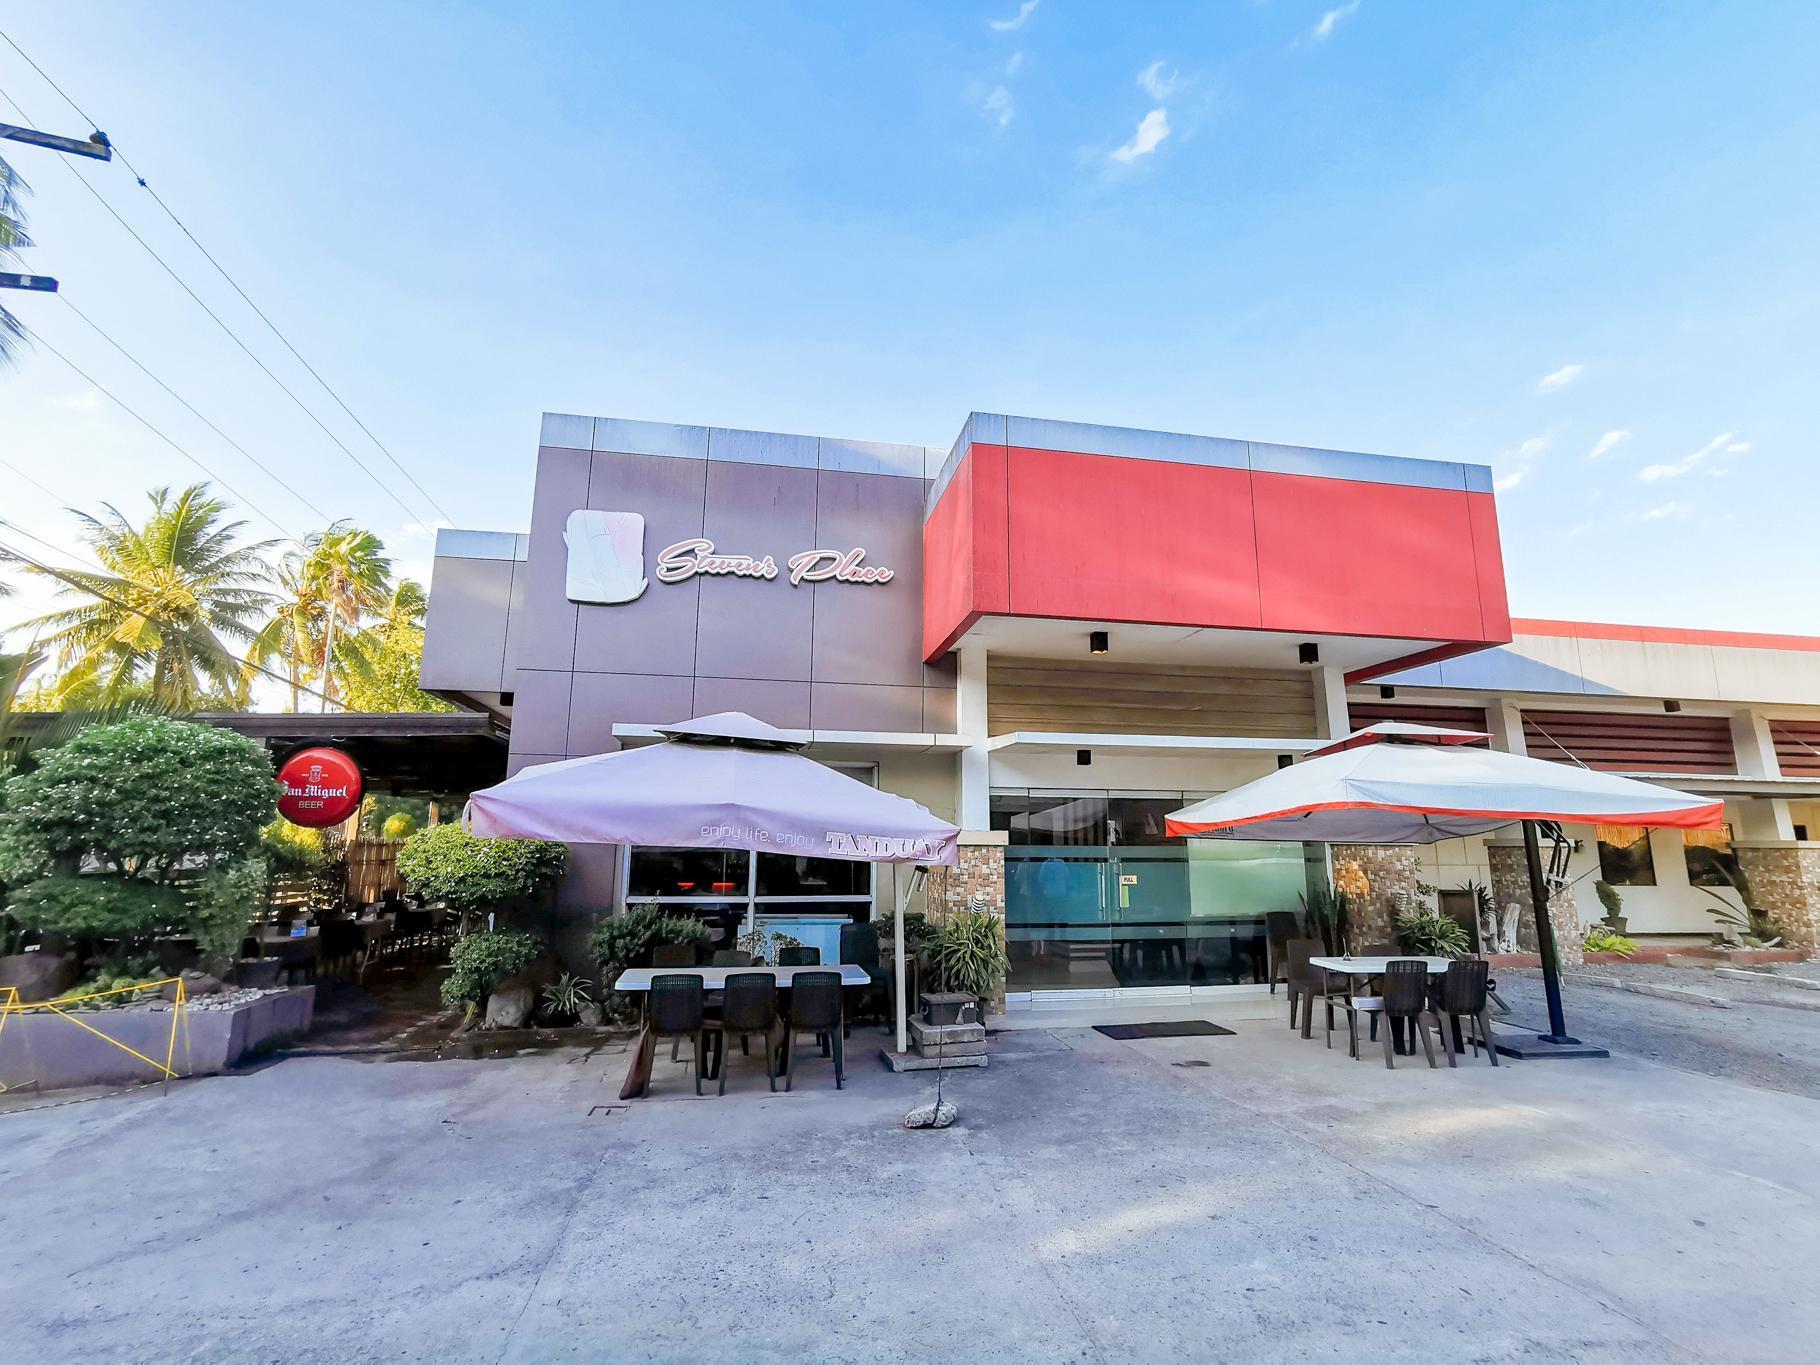 Reddoorz Plus near Robinsons Place Gensan, General Santos City